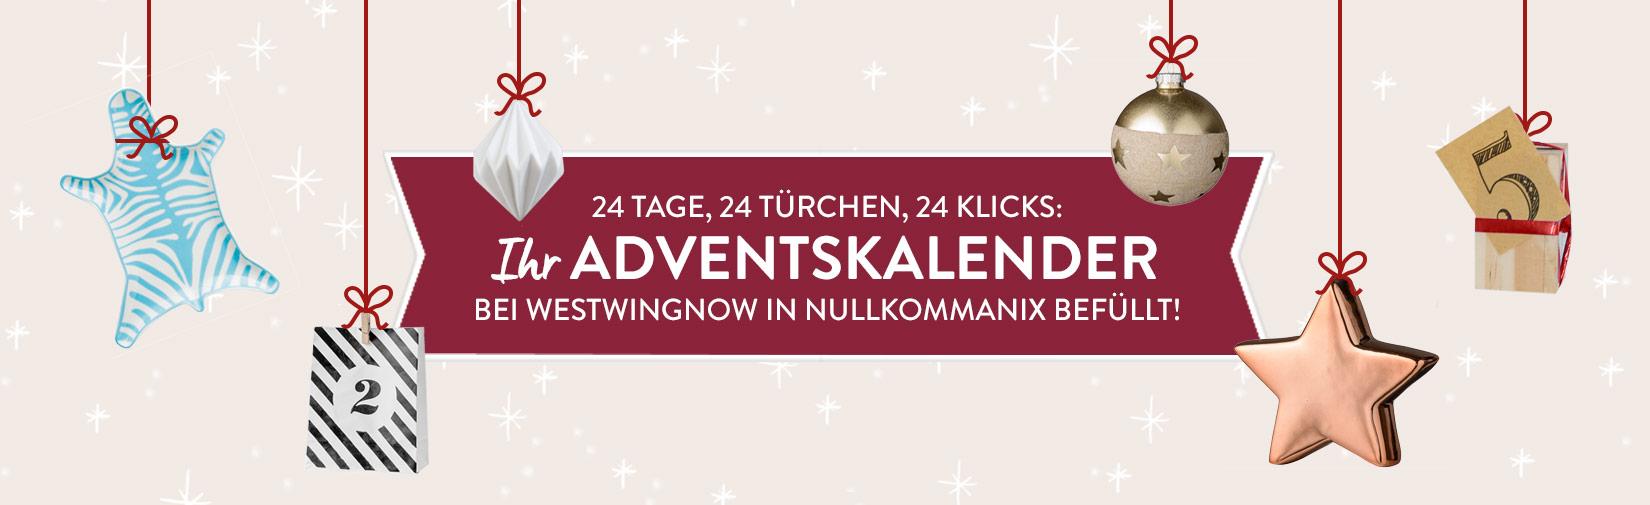 Landingpage Adventskalender